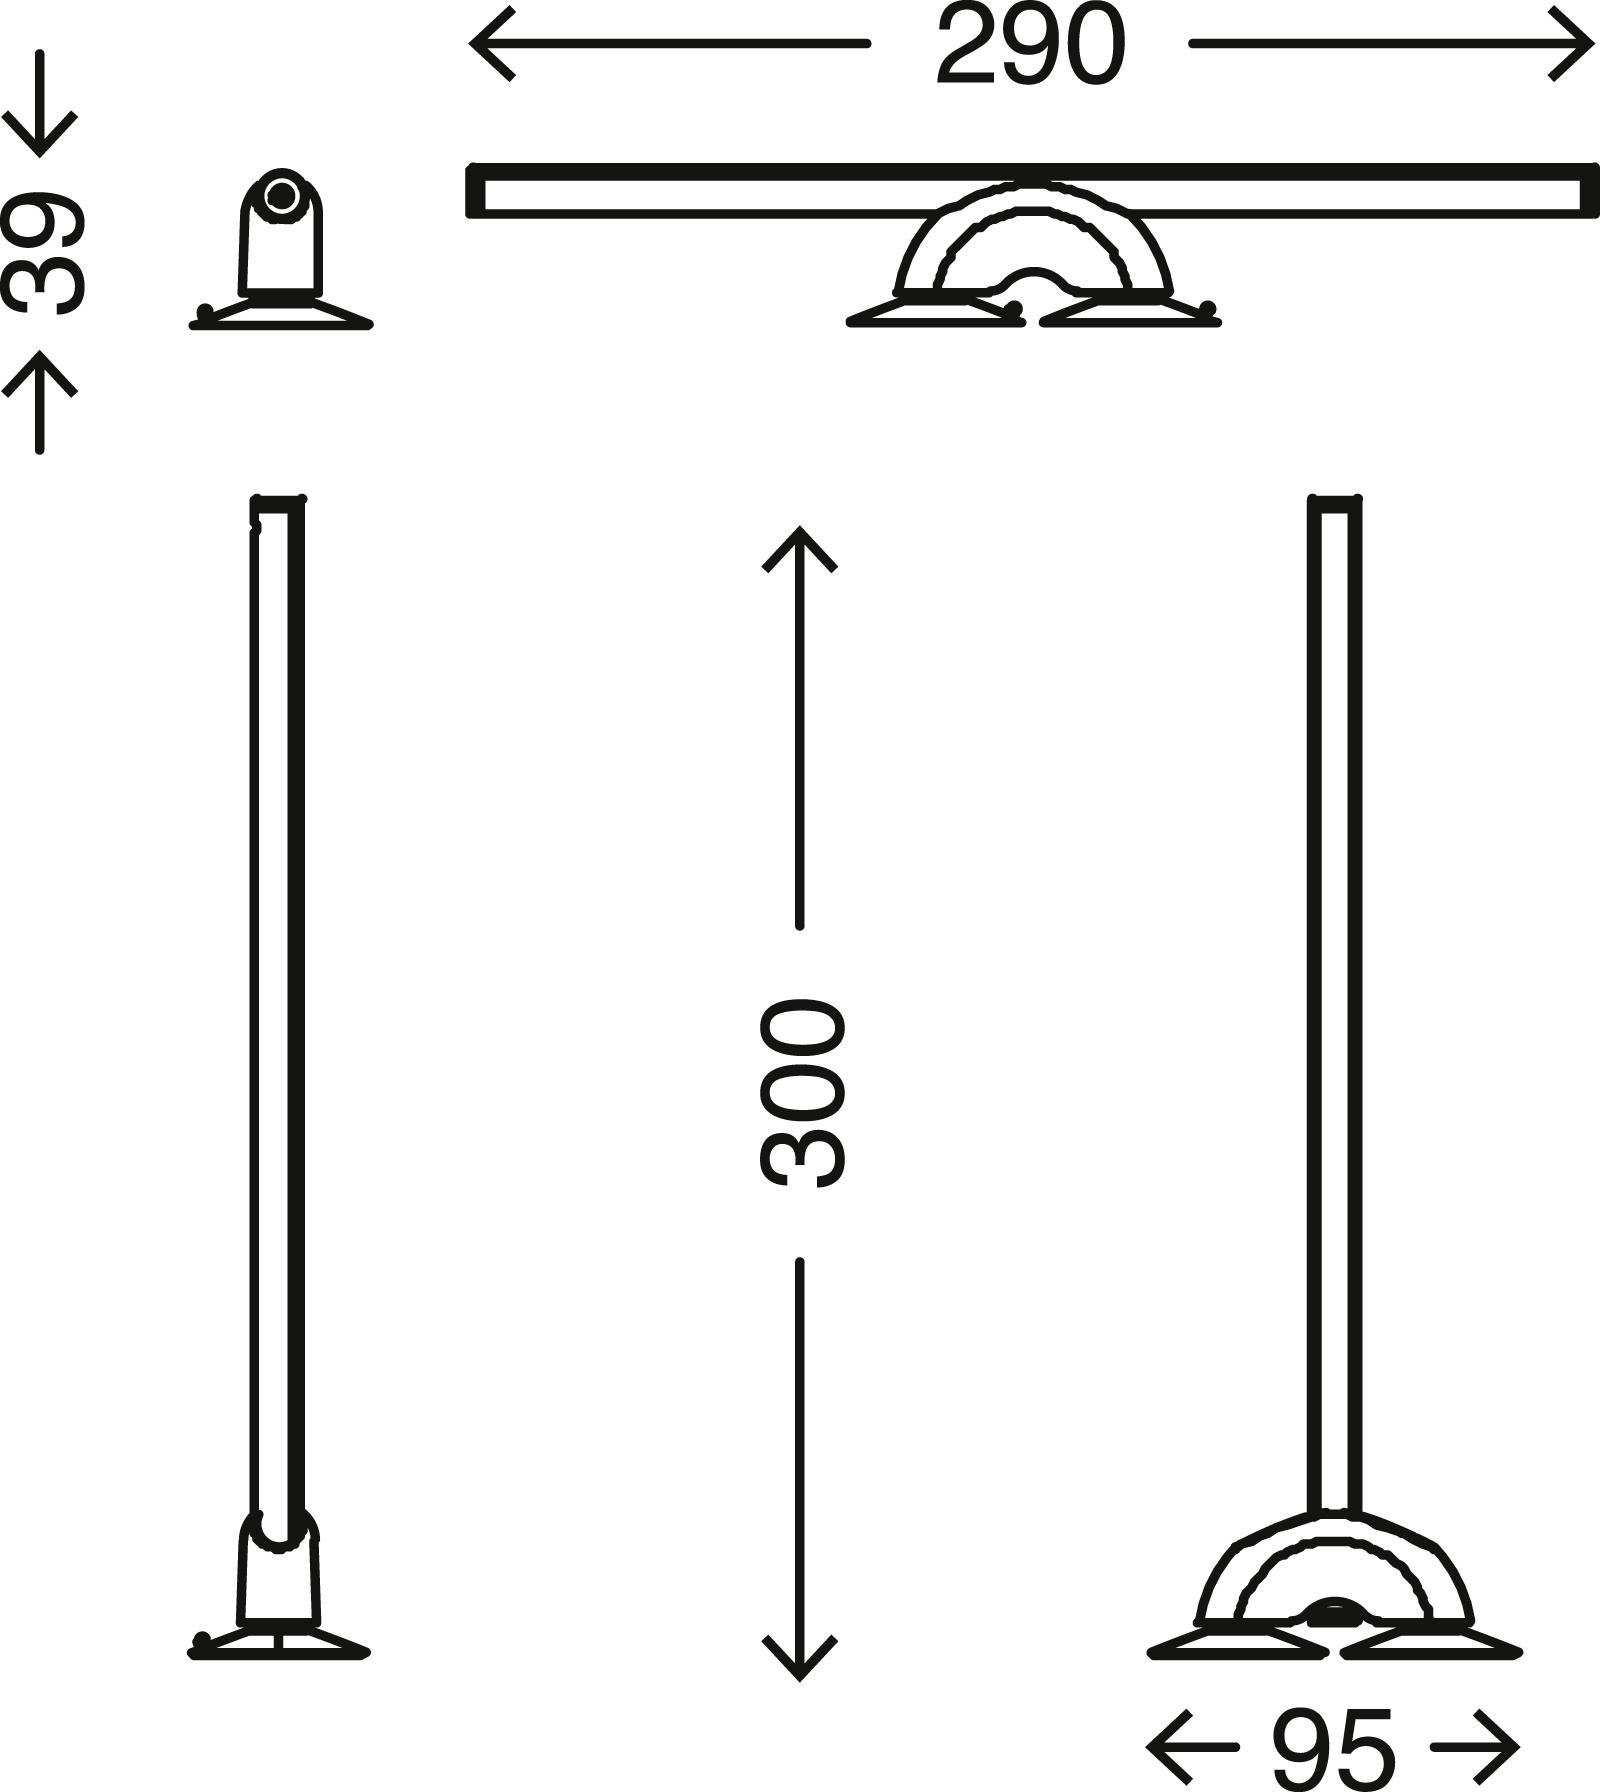 LED Spiegelleuchte, 29 cm, 7 W, 300-340 lm, Alu